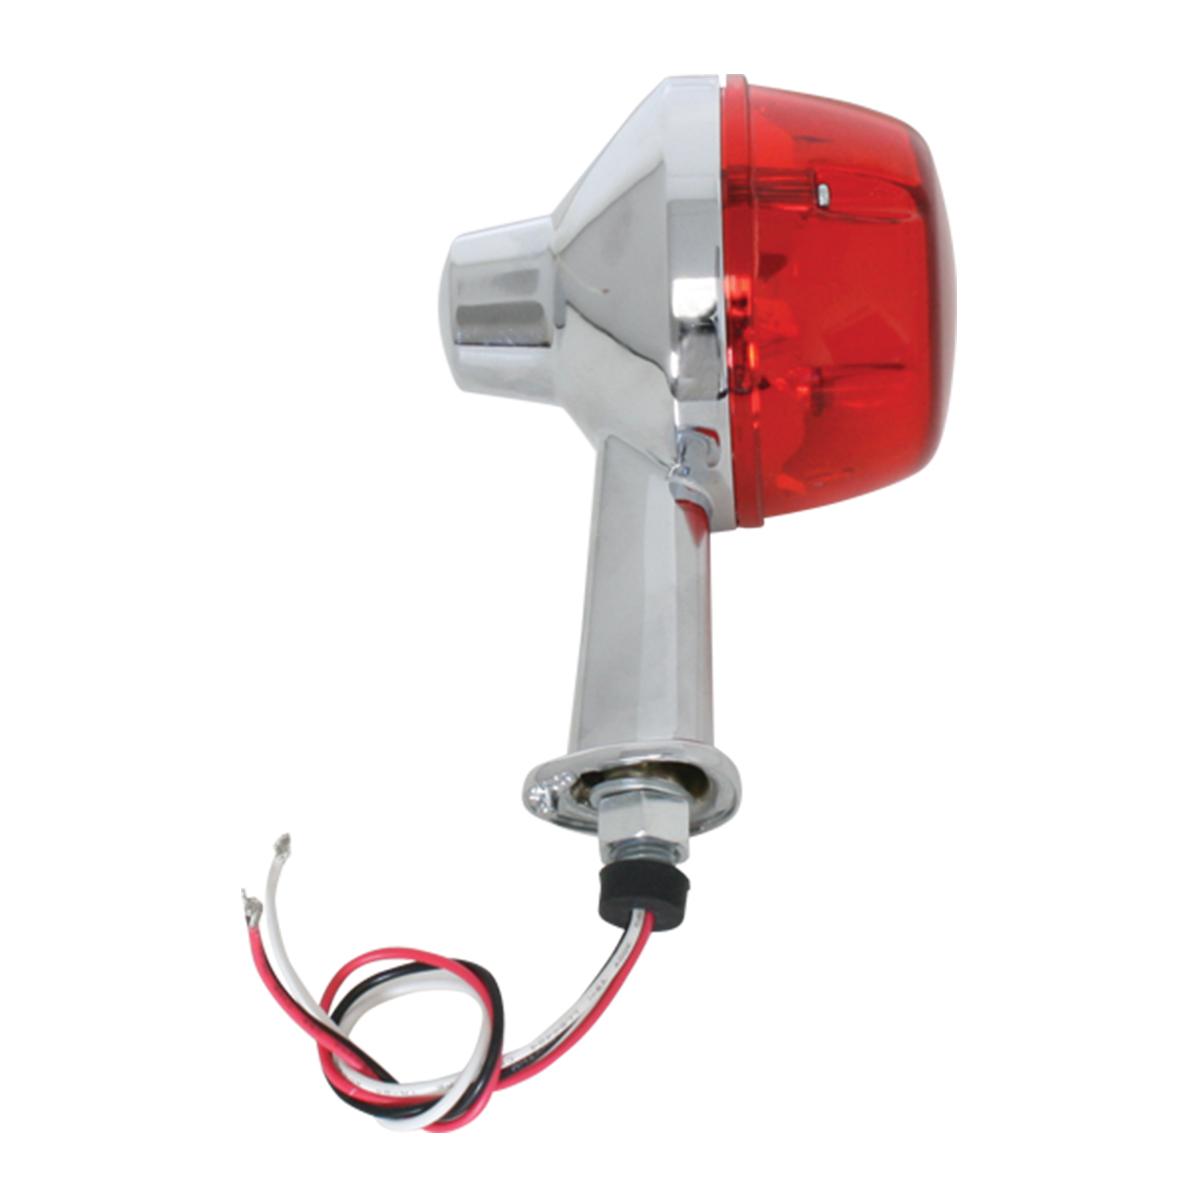 Single Face Honda Spyder LED Pedestal Light in Red/Red